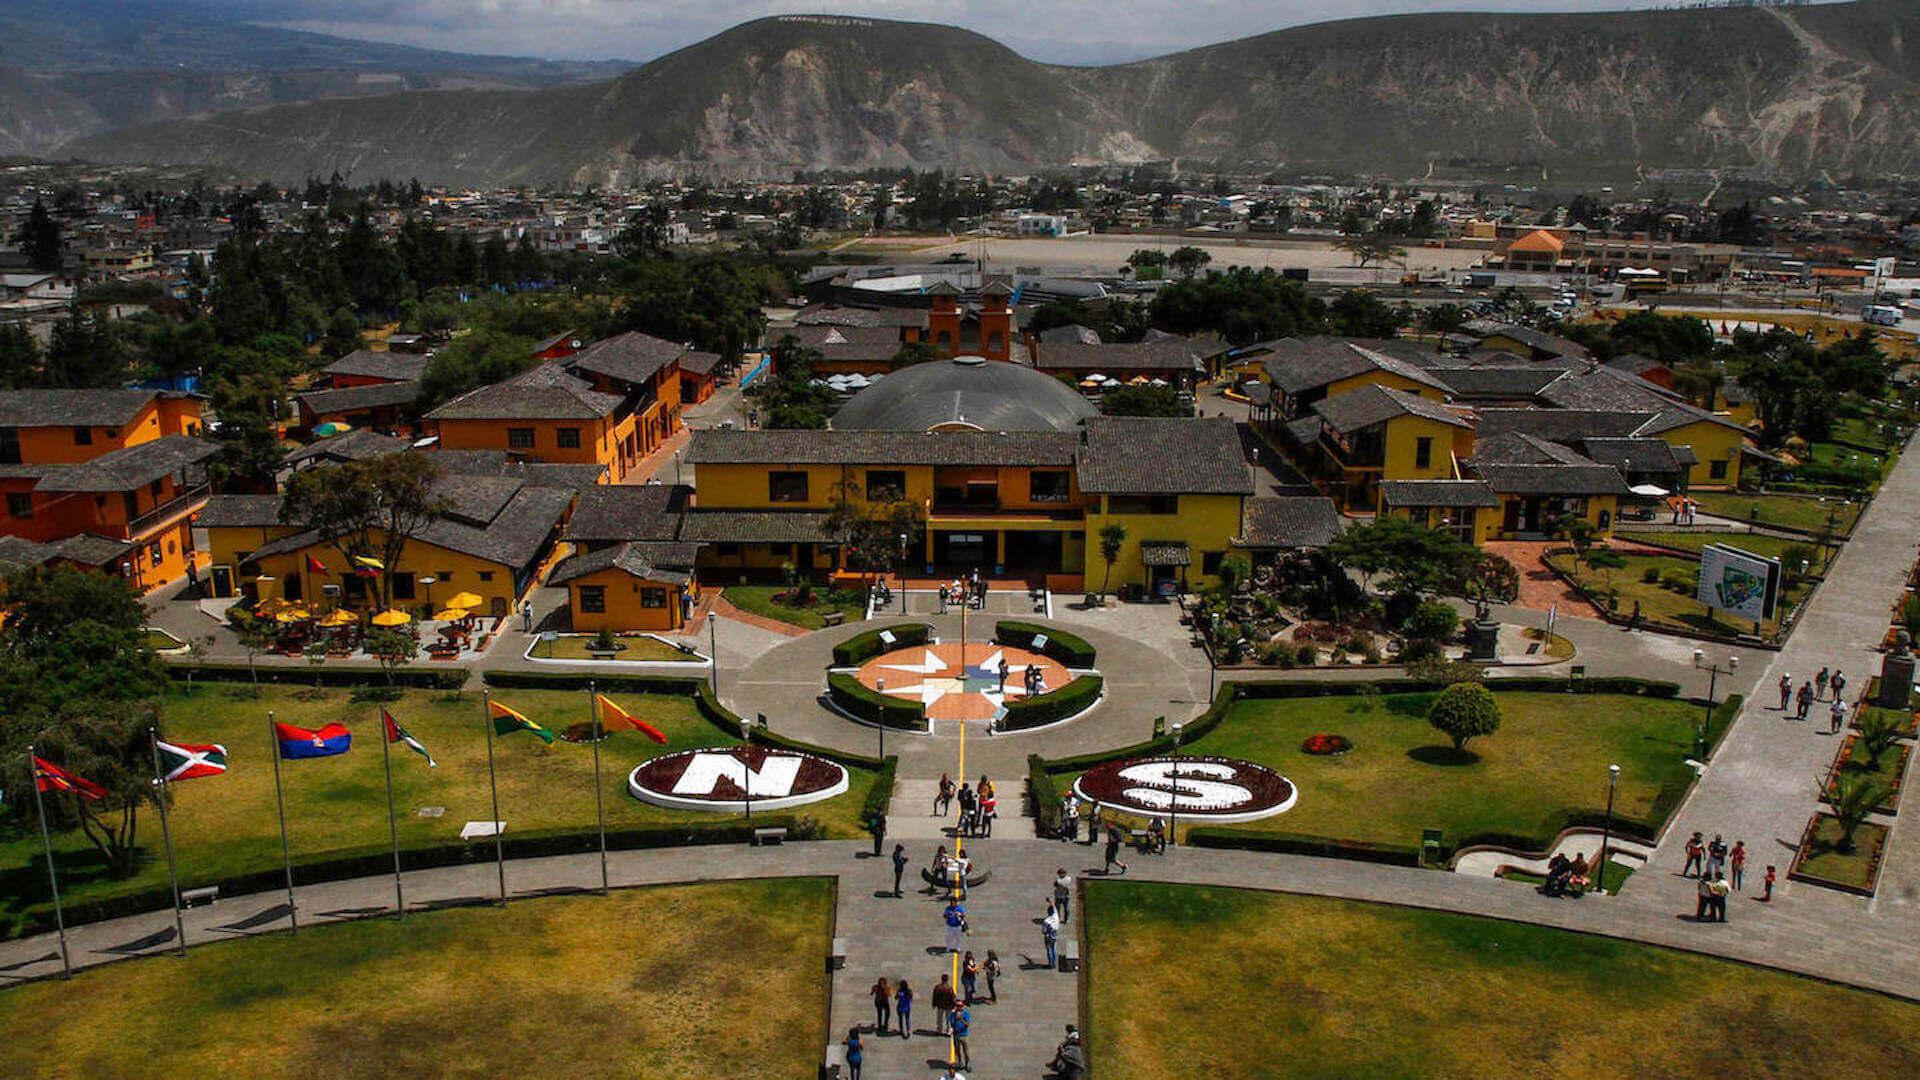 De evenaar bij Mitad del Mundo ten noorden van Quito in Ecuador